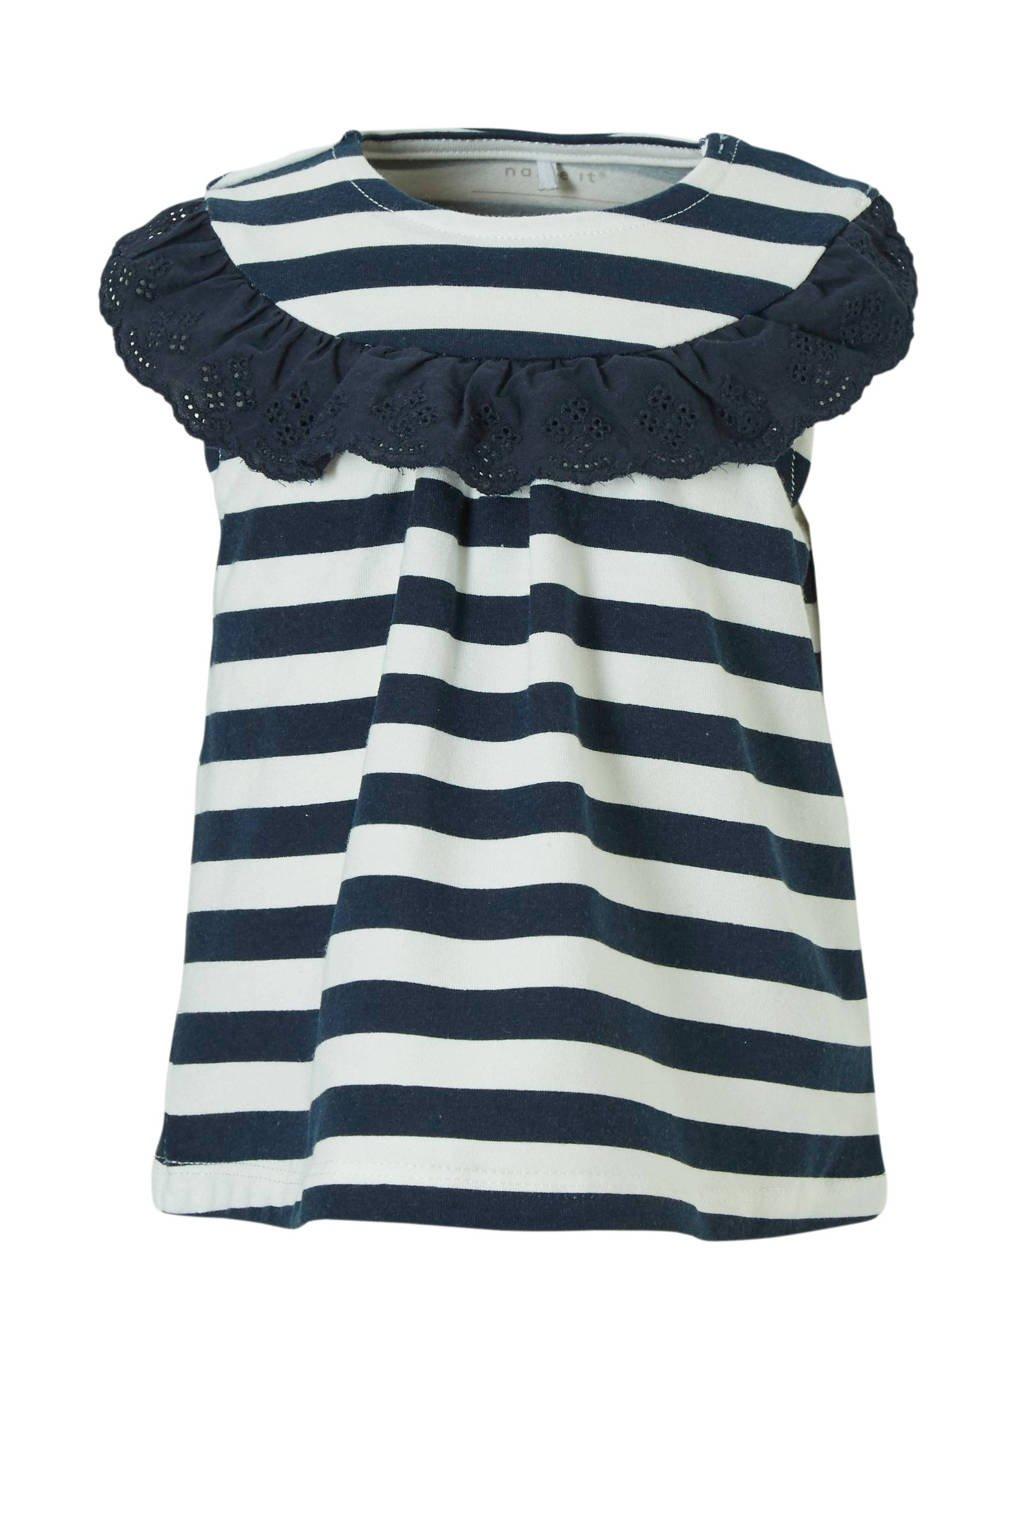 NAME IT newborn gestreepte jurk Faith, Donkerblauw/ wit